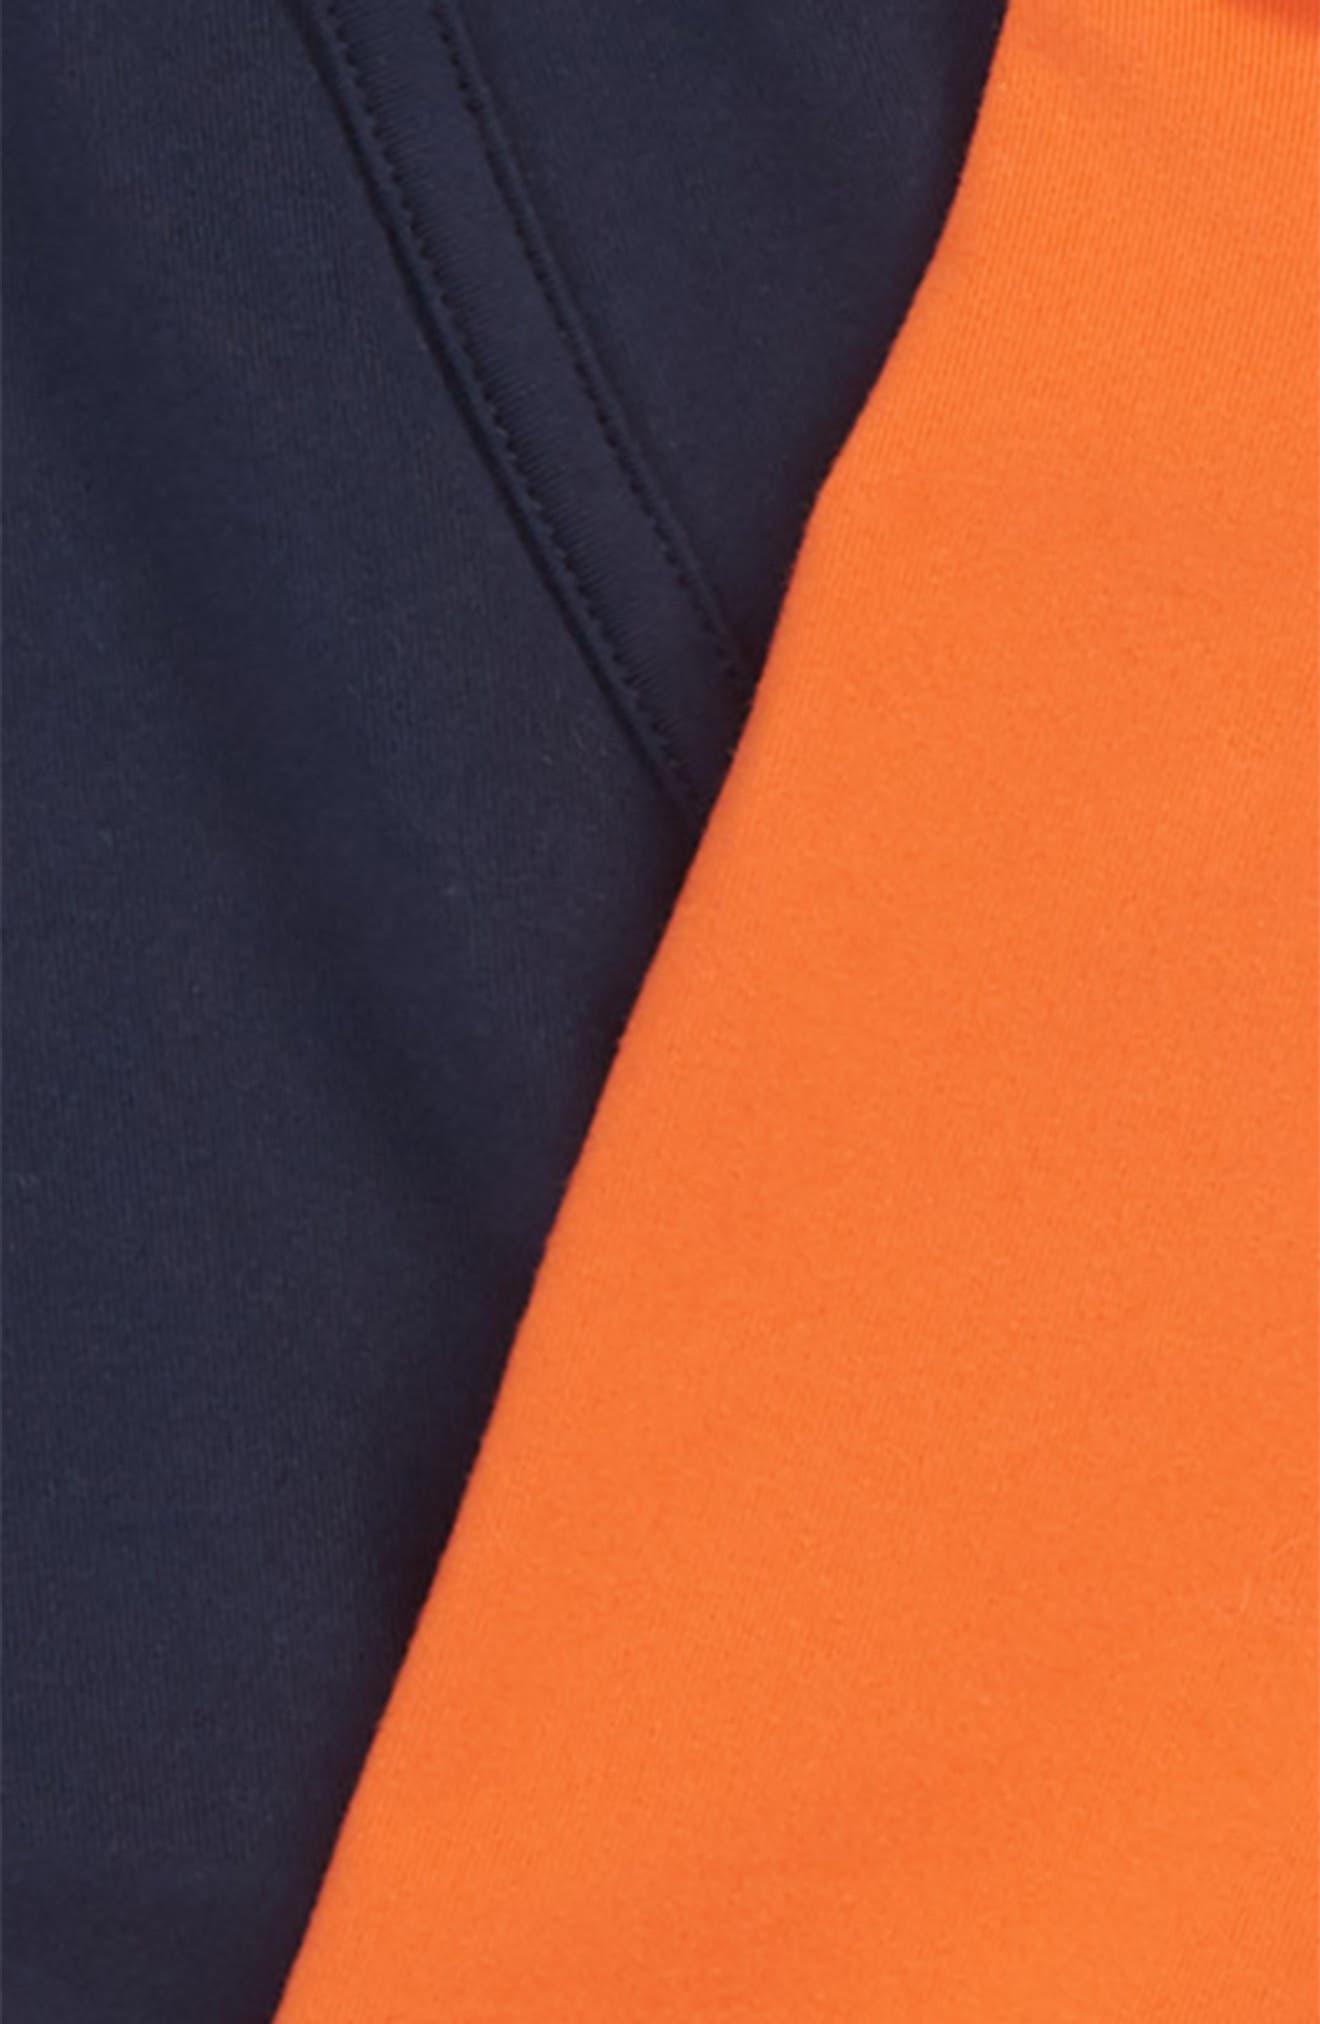 2-Pack Boxer Briefs,                             Alternate thumbnail 2, color,                             Black Iris/Tigerlily